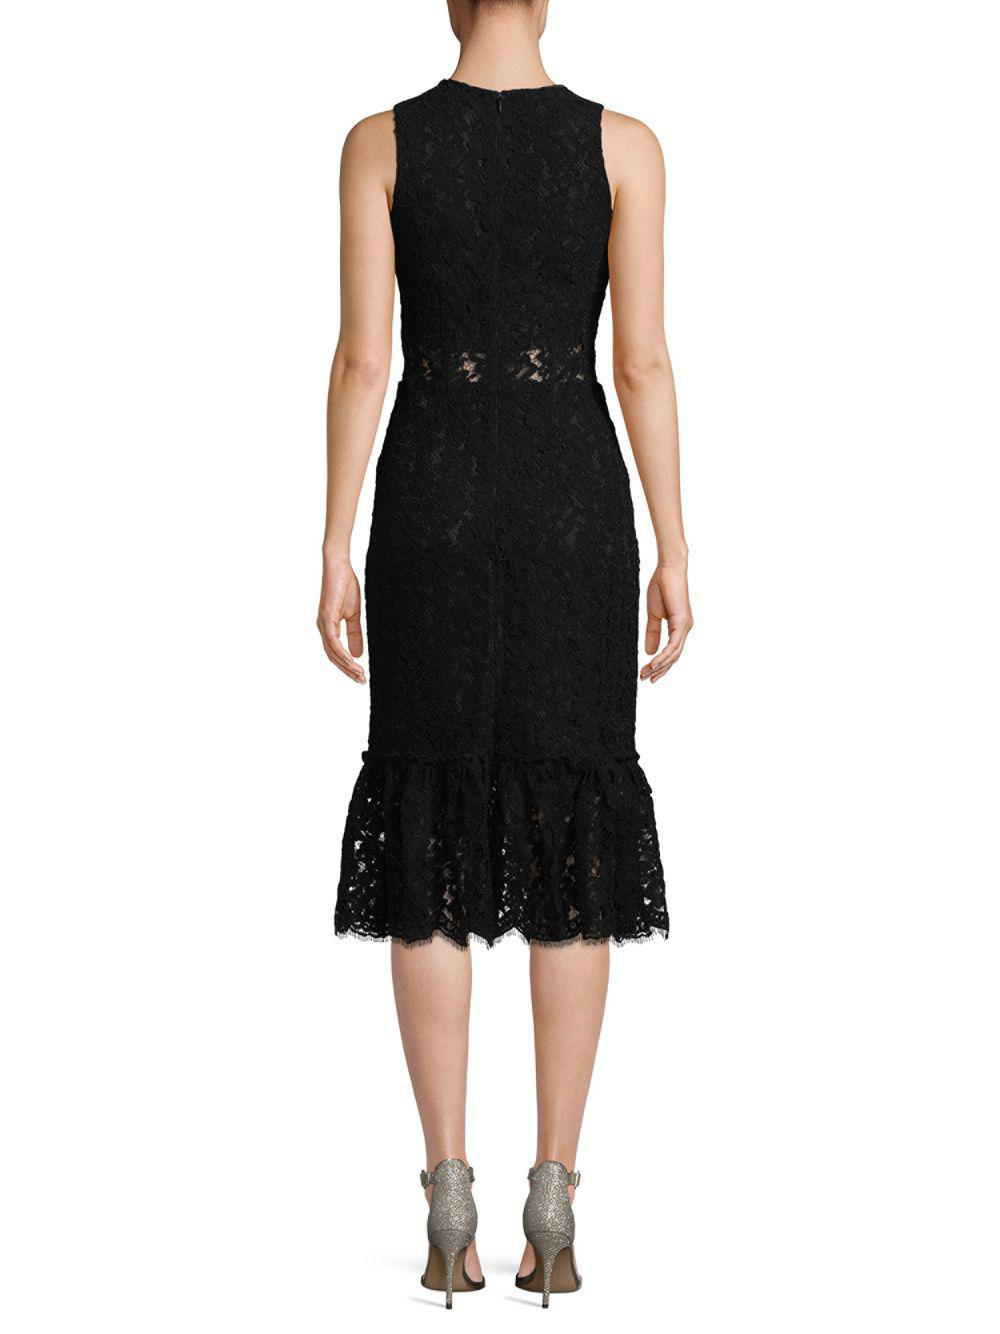 b6d166df1e6f Alexia Admor - Black Lace Midi Dress - Lyst. View fullscreen